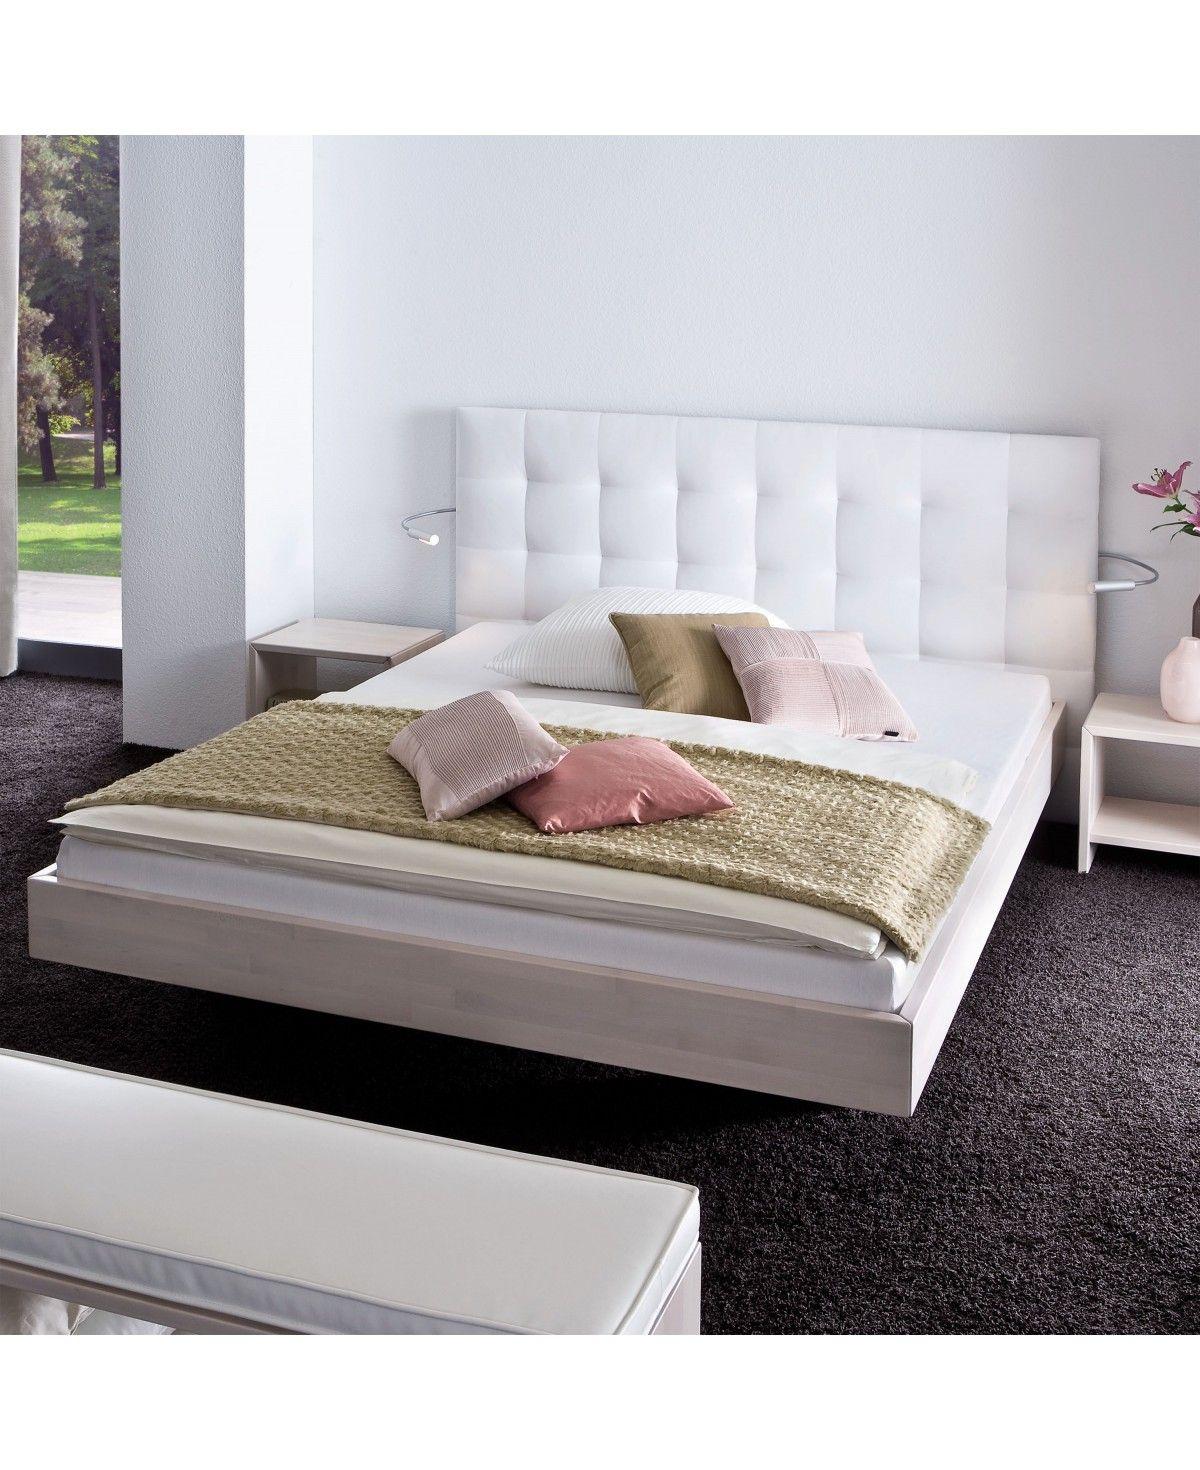 Hasena Wood Line Bett Wandpaneel Sogno L Füße Vilo Buche Weiß 200x220